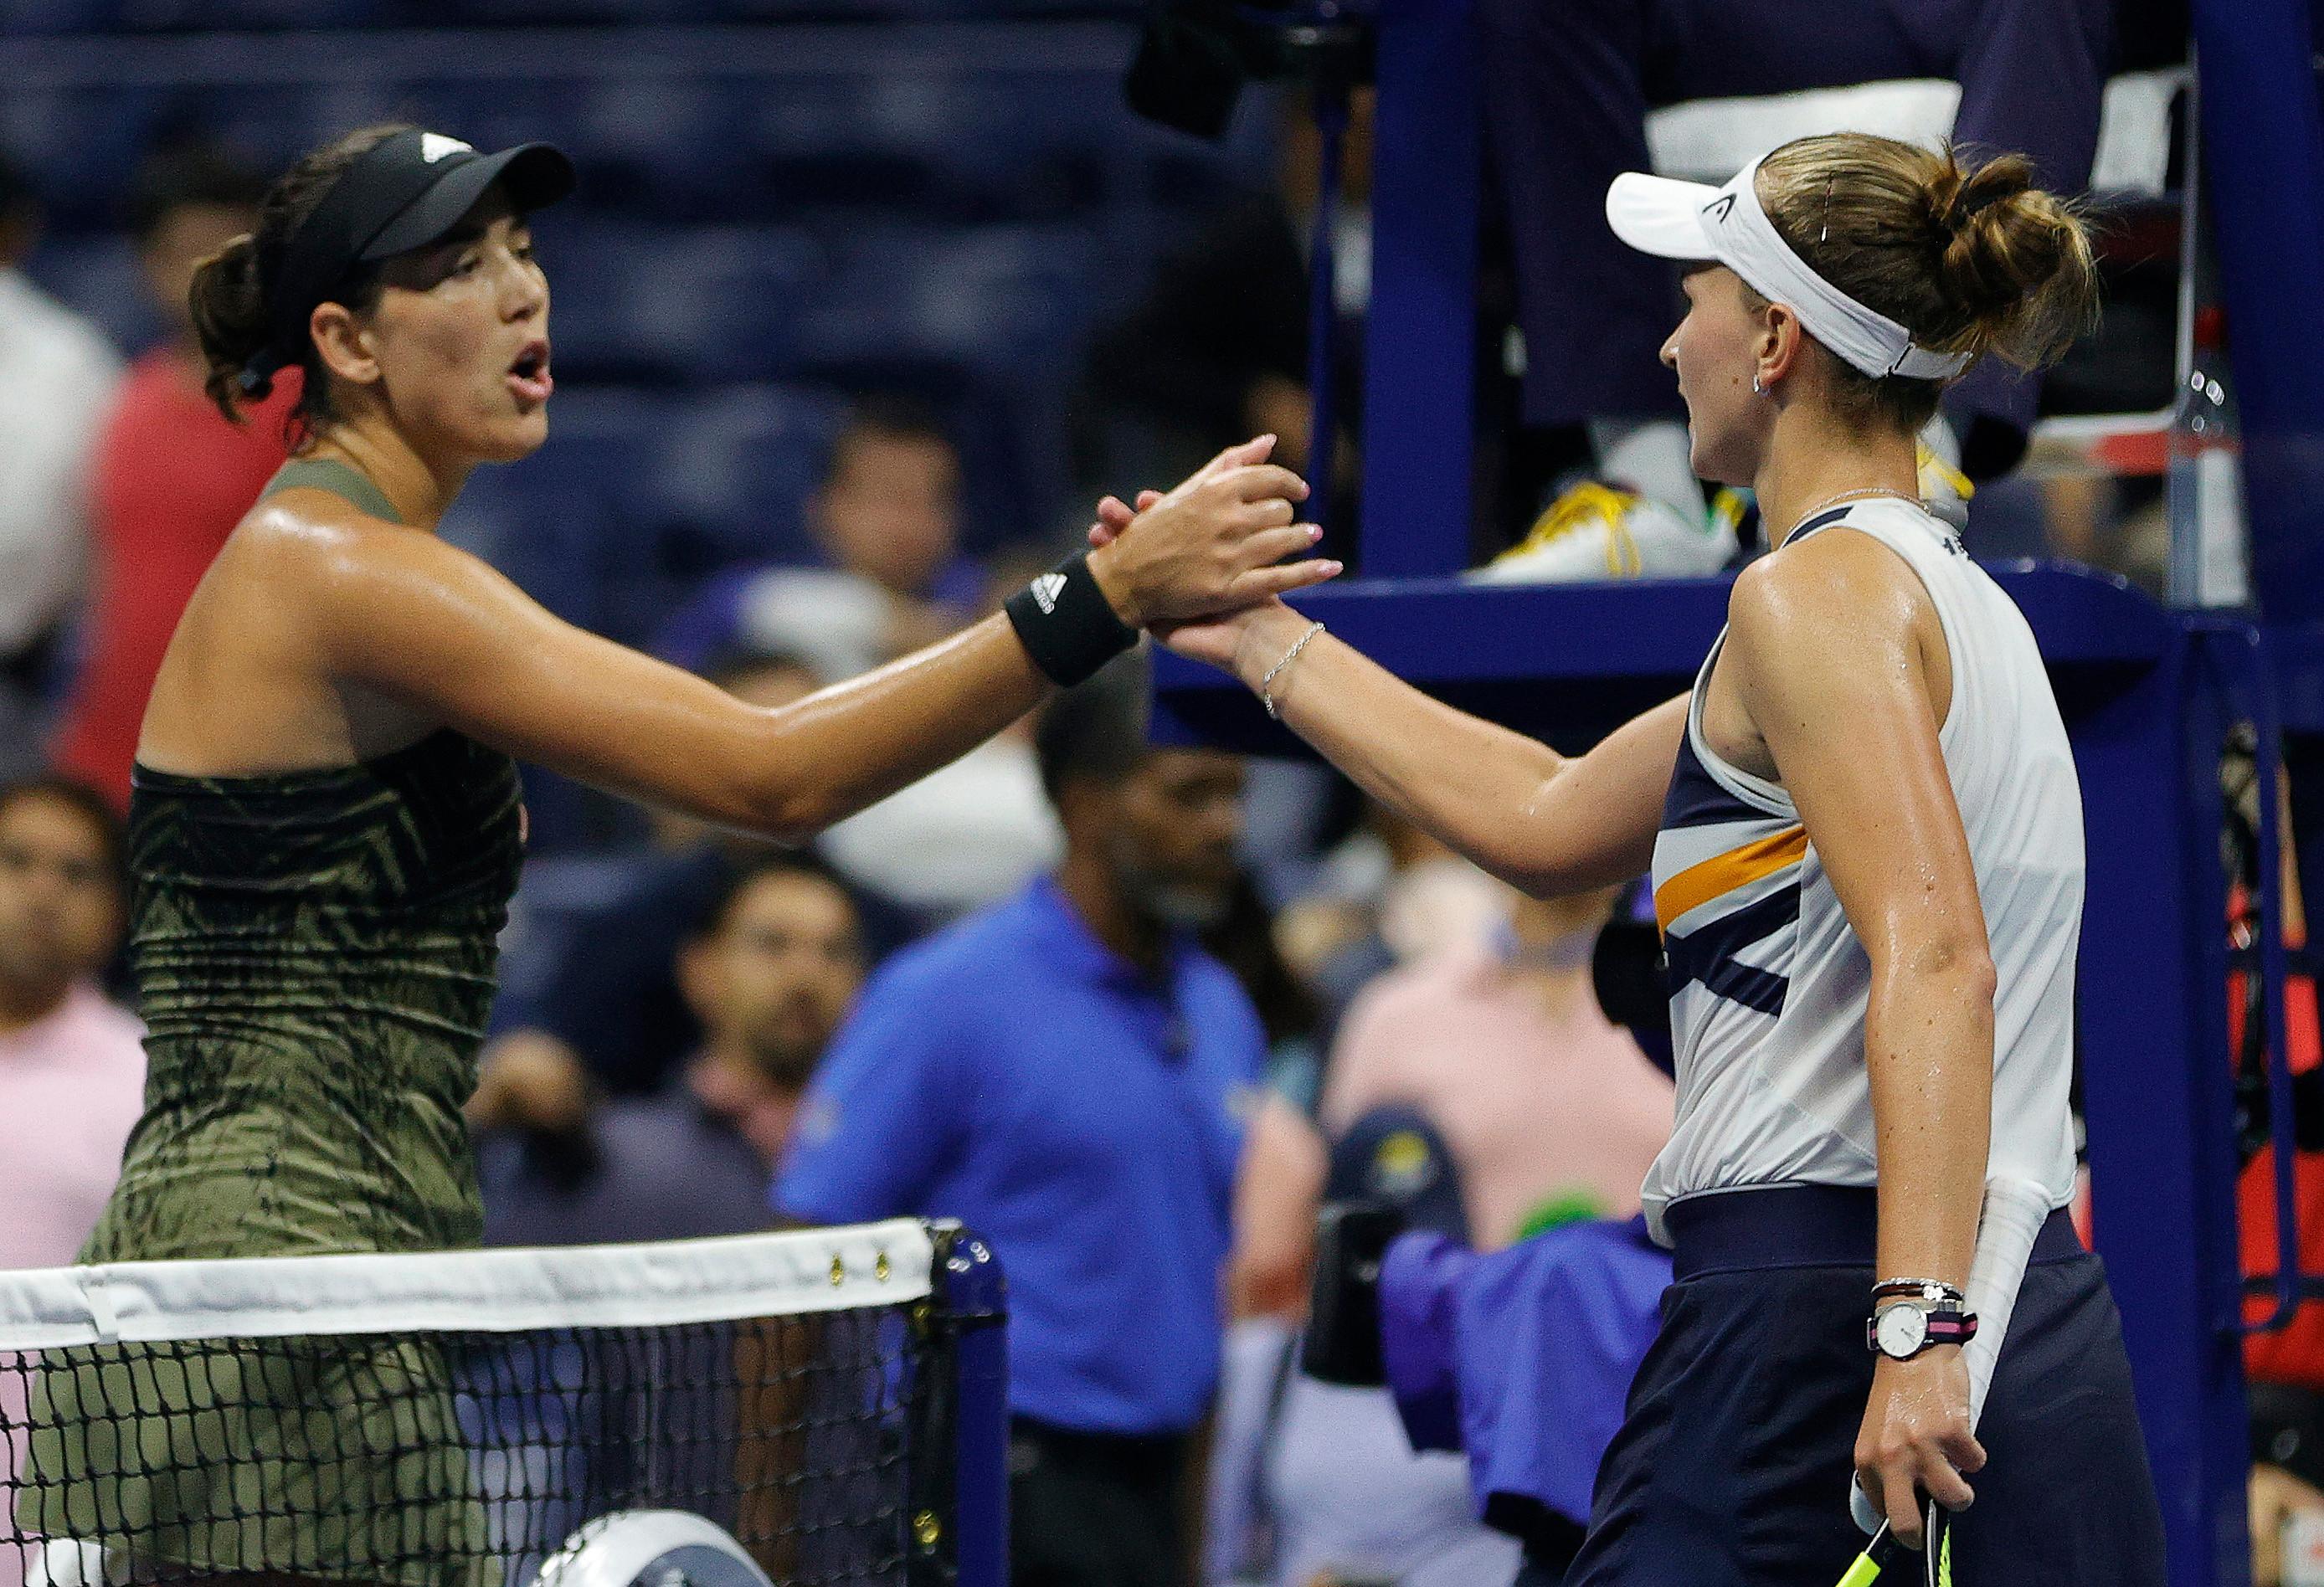 Garbine Muguruza angered by 'unprofessional' Barbora Krejcikova in US Open defeat